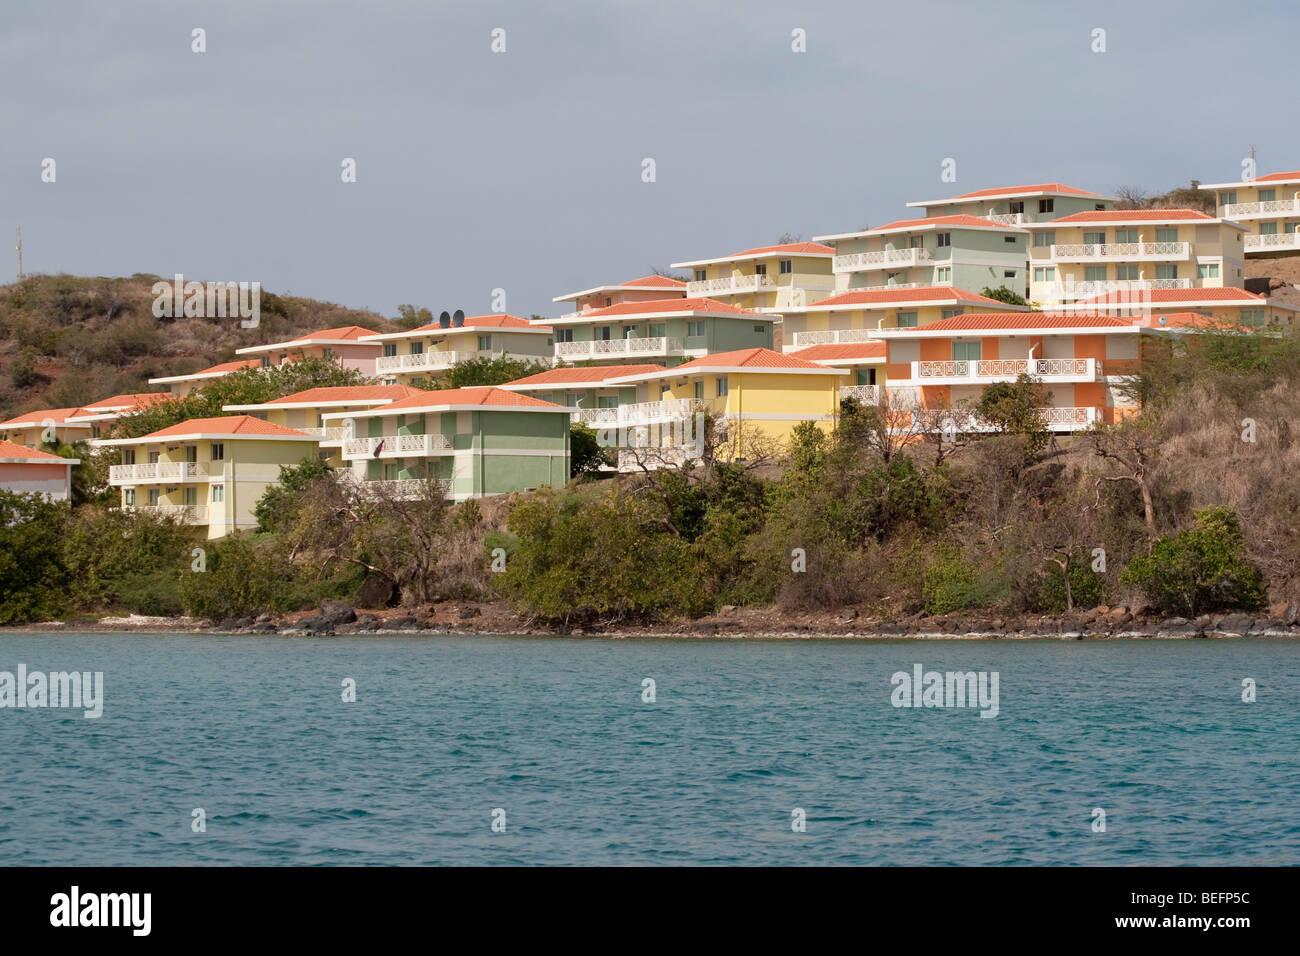 Hillside development on the north shore in ensenada honda for Honda north shore